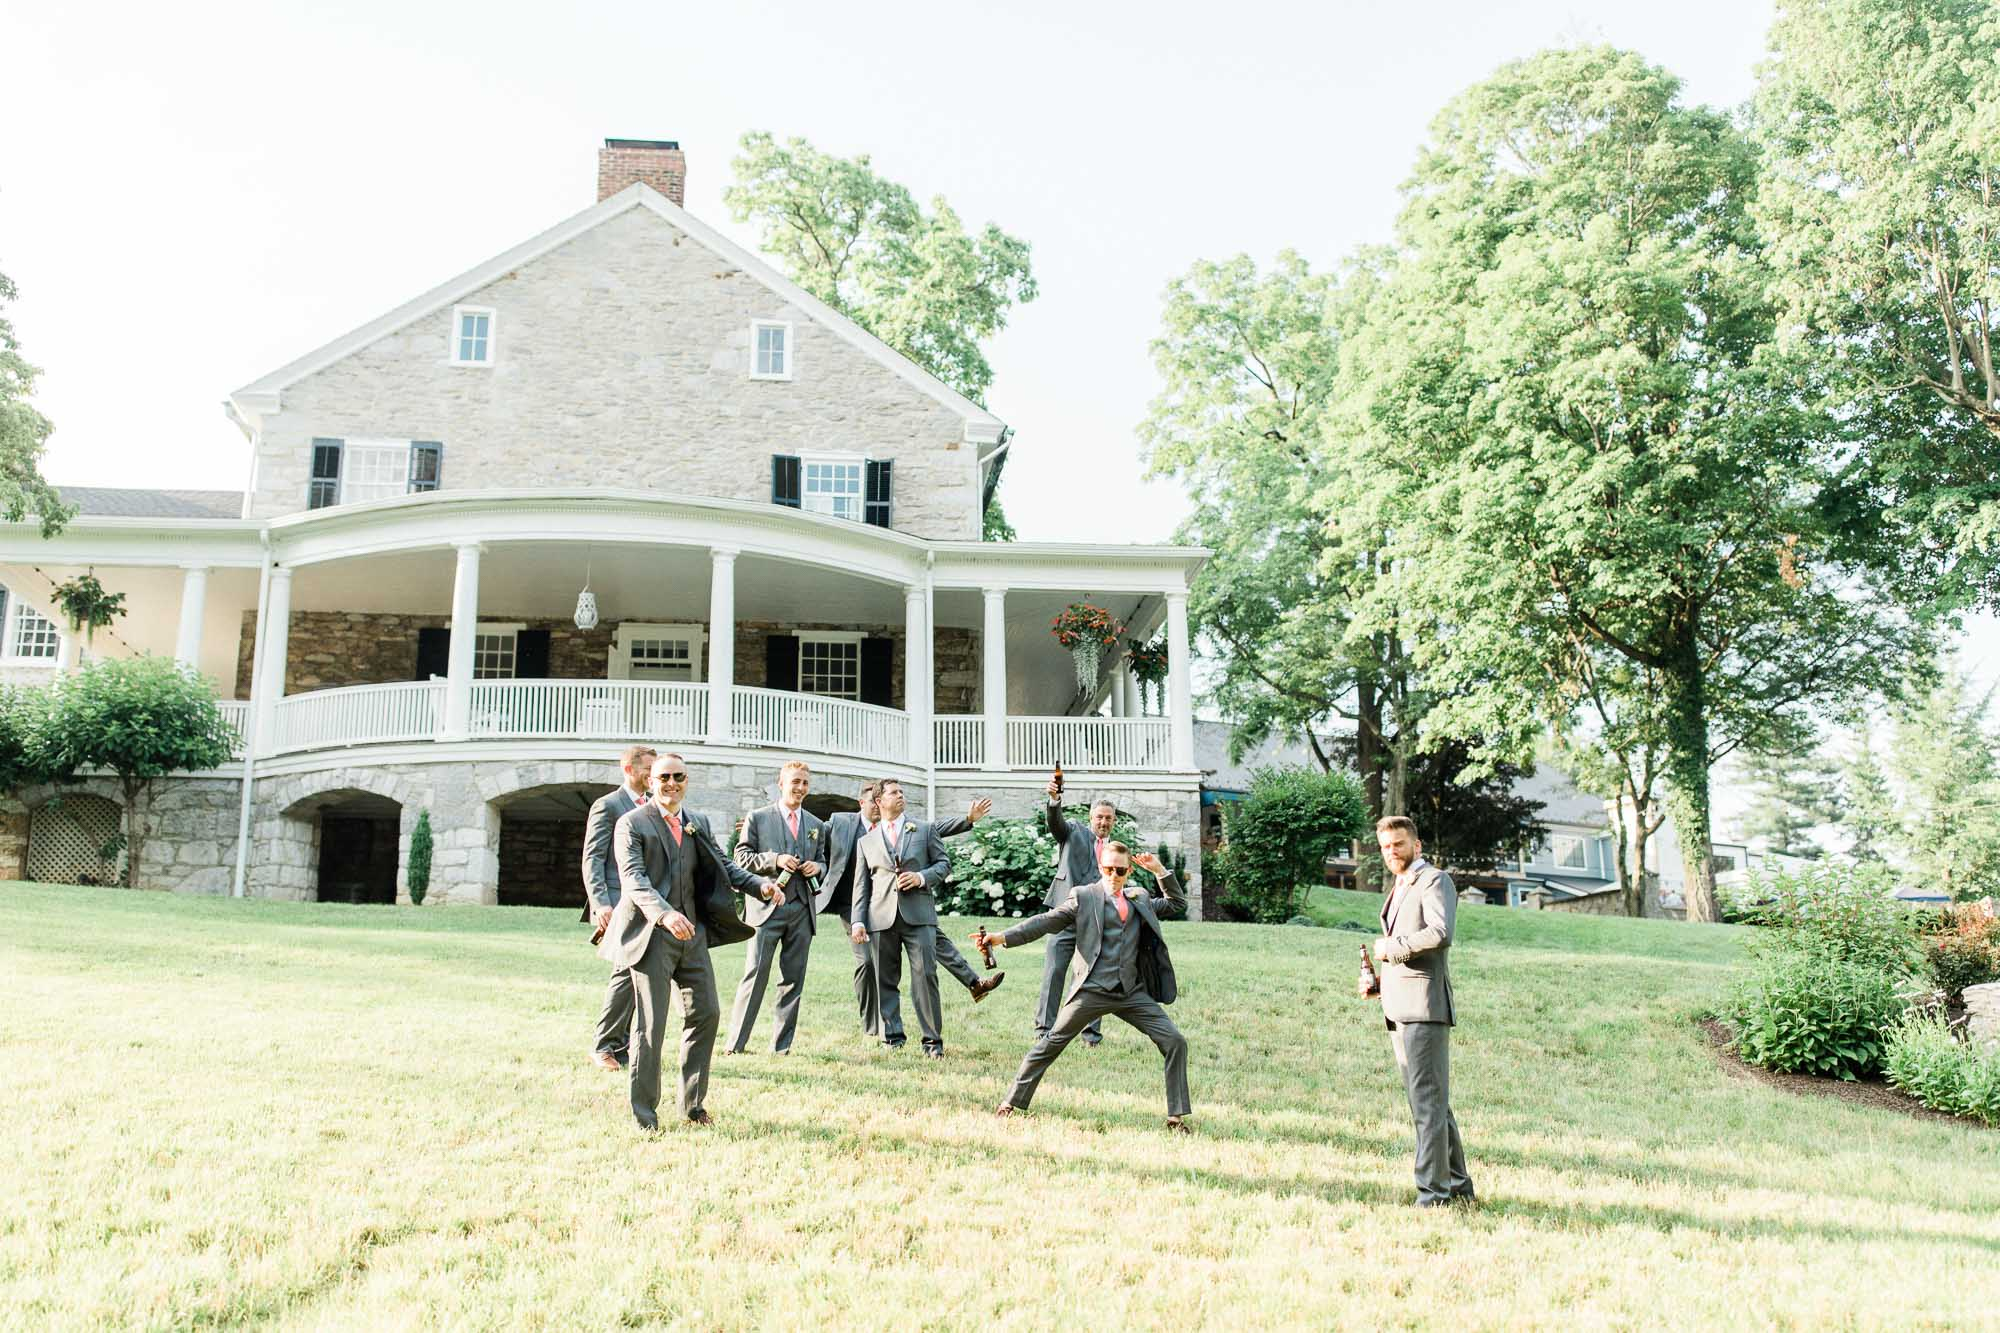 Allenberry-resort-historic-pennsylvania-wedding-10212.jpg